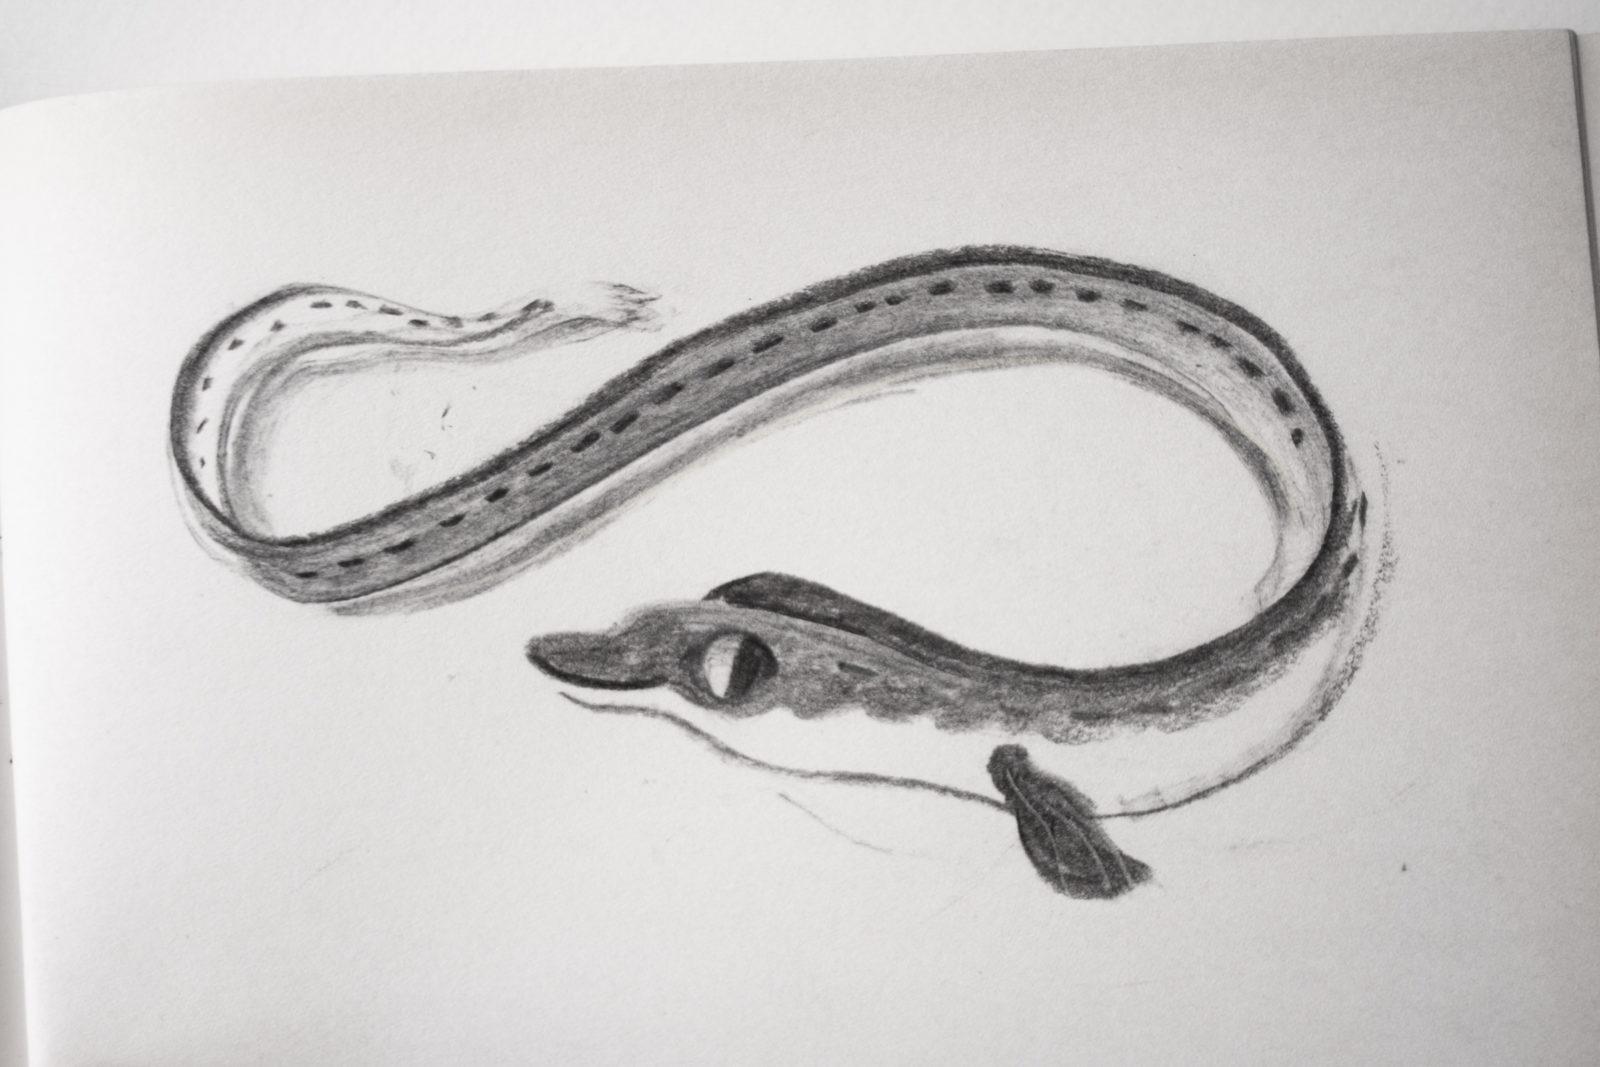 Eel by Pyhai